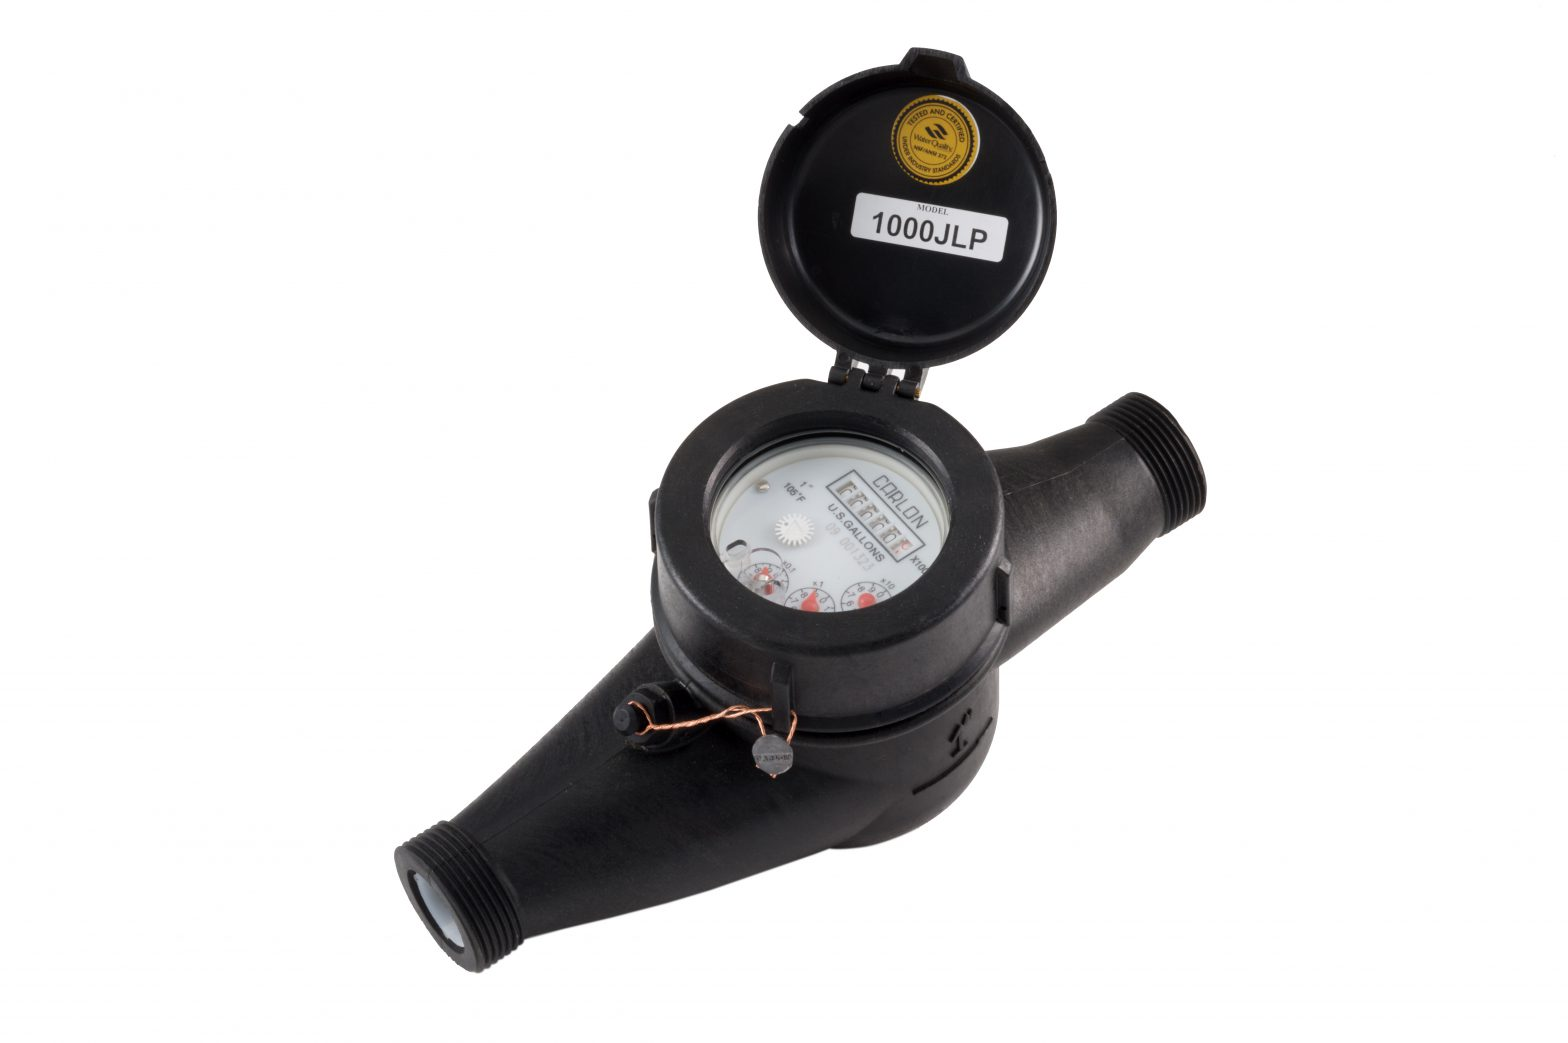 Carlon JLP Series Plastic Water Meters